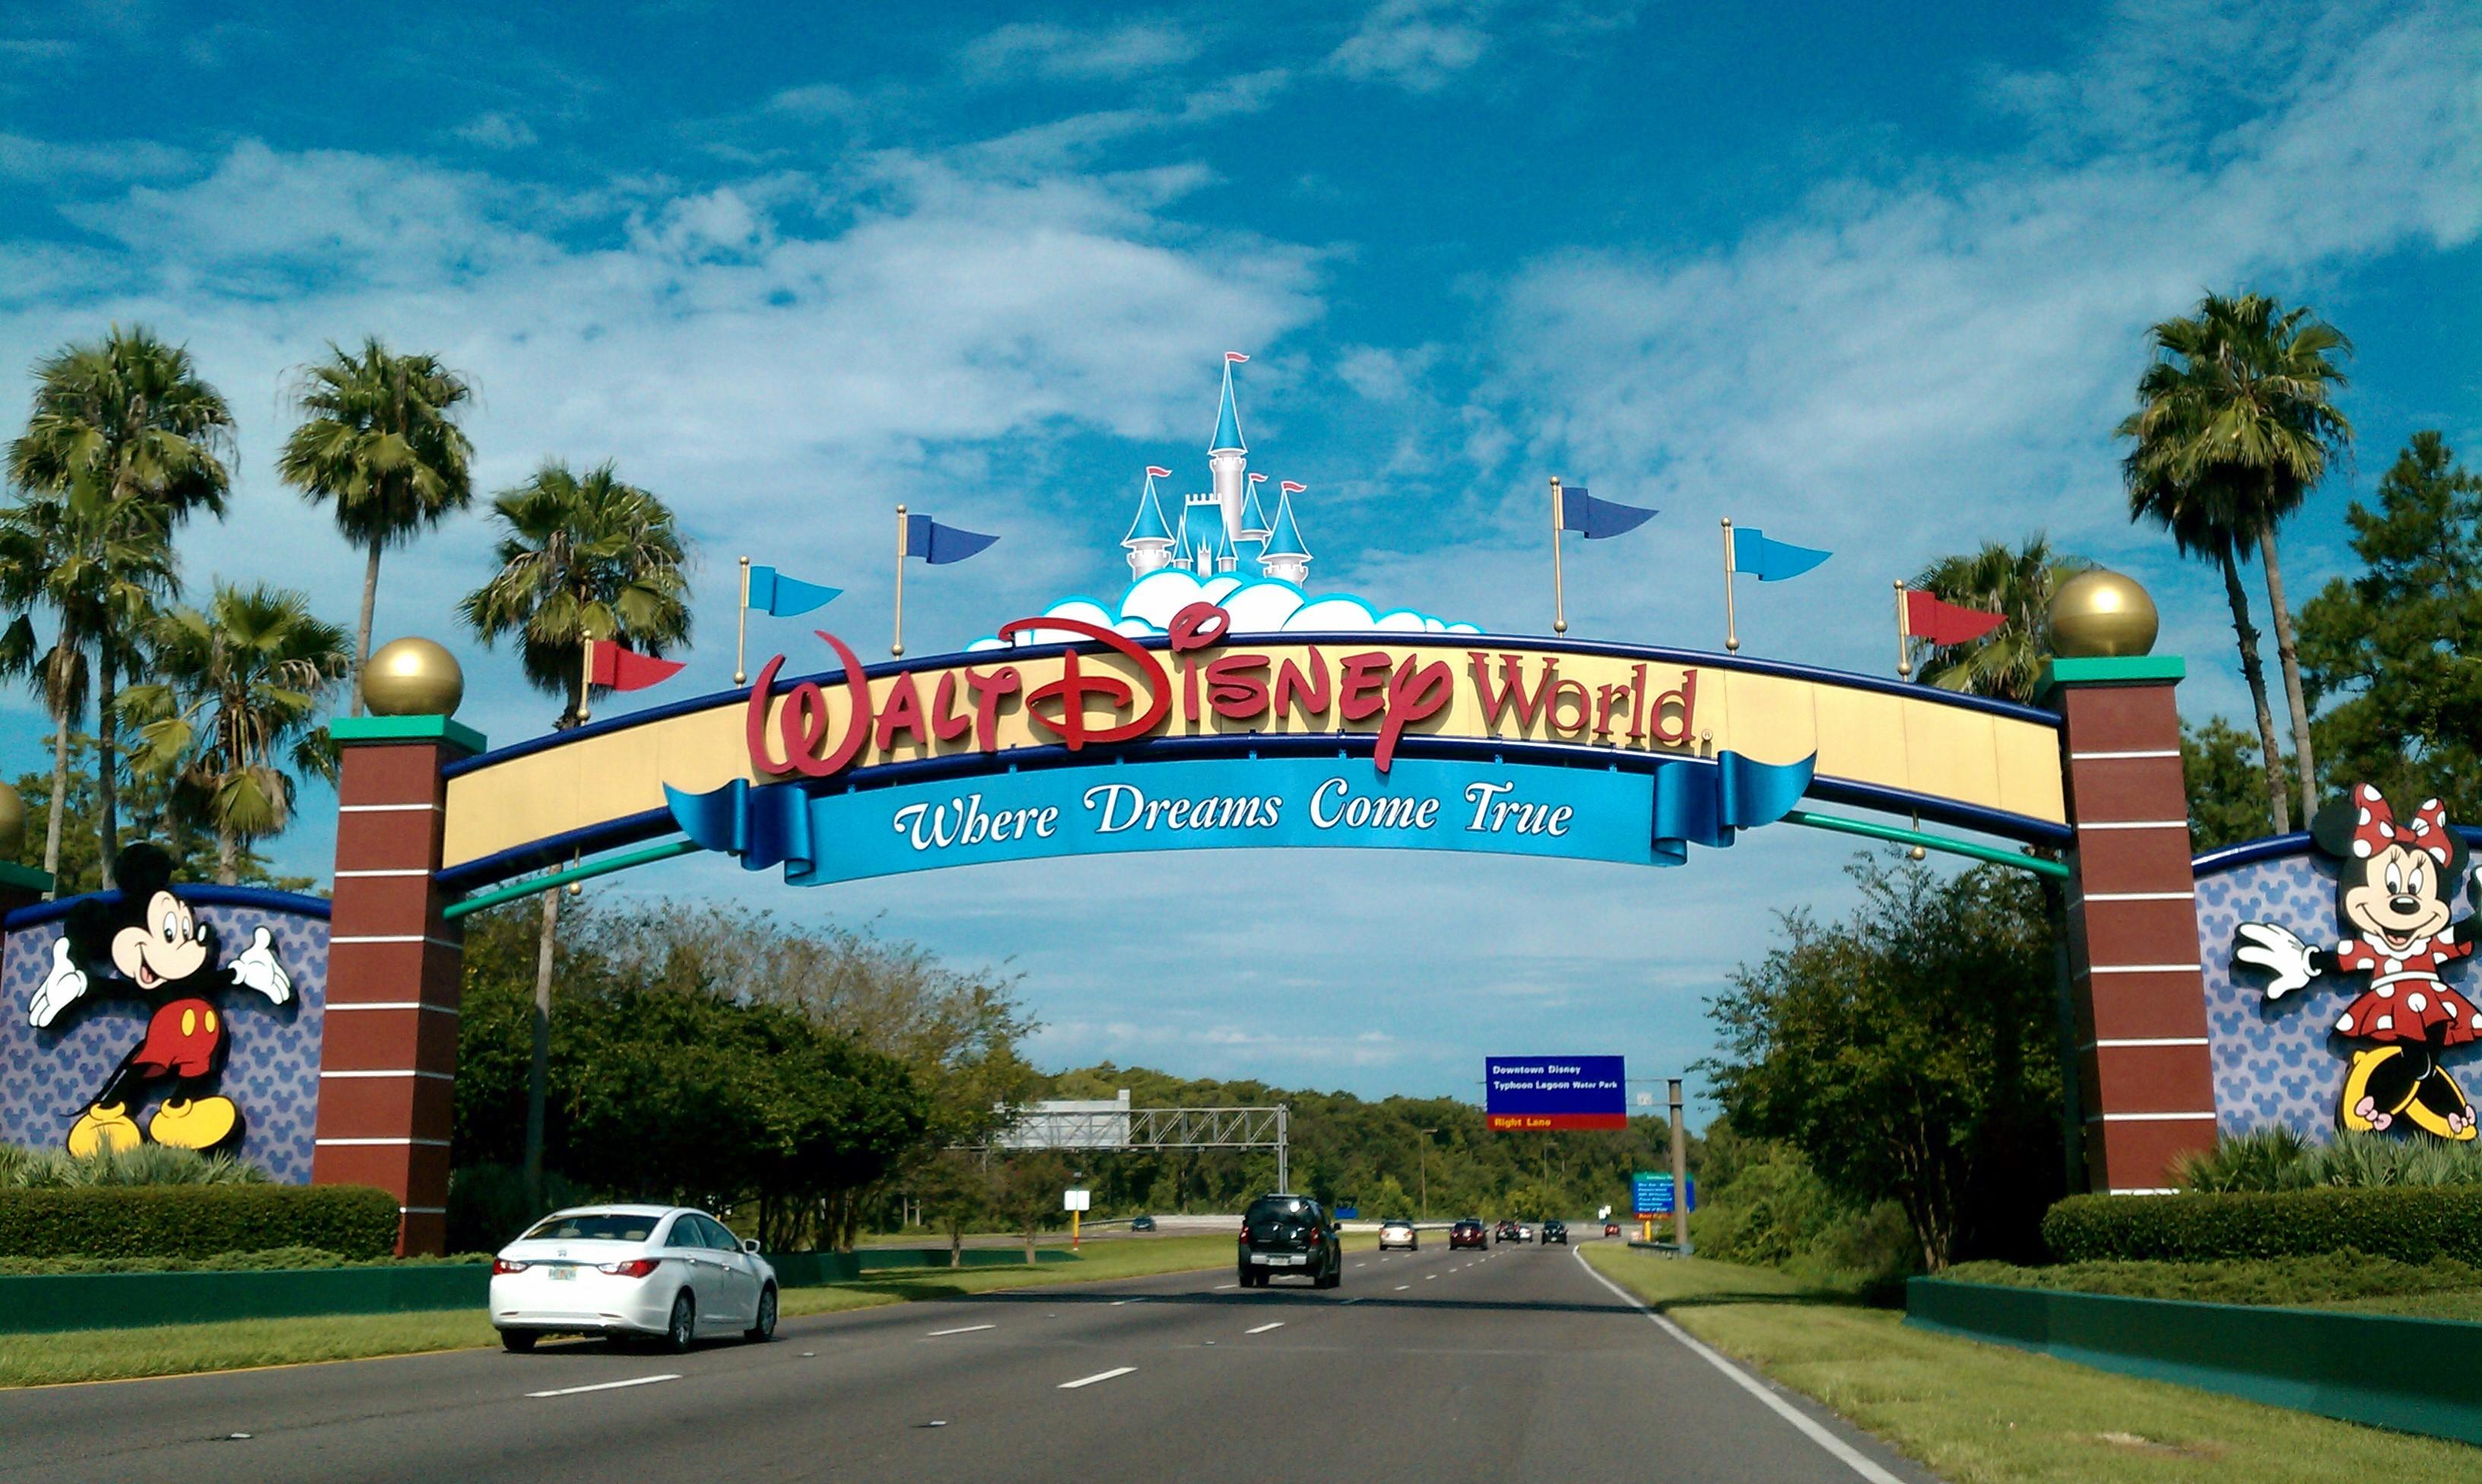 Worker dies after falling into vat of oil near amusement park